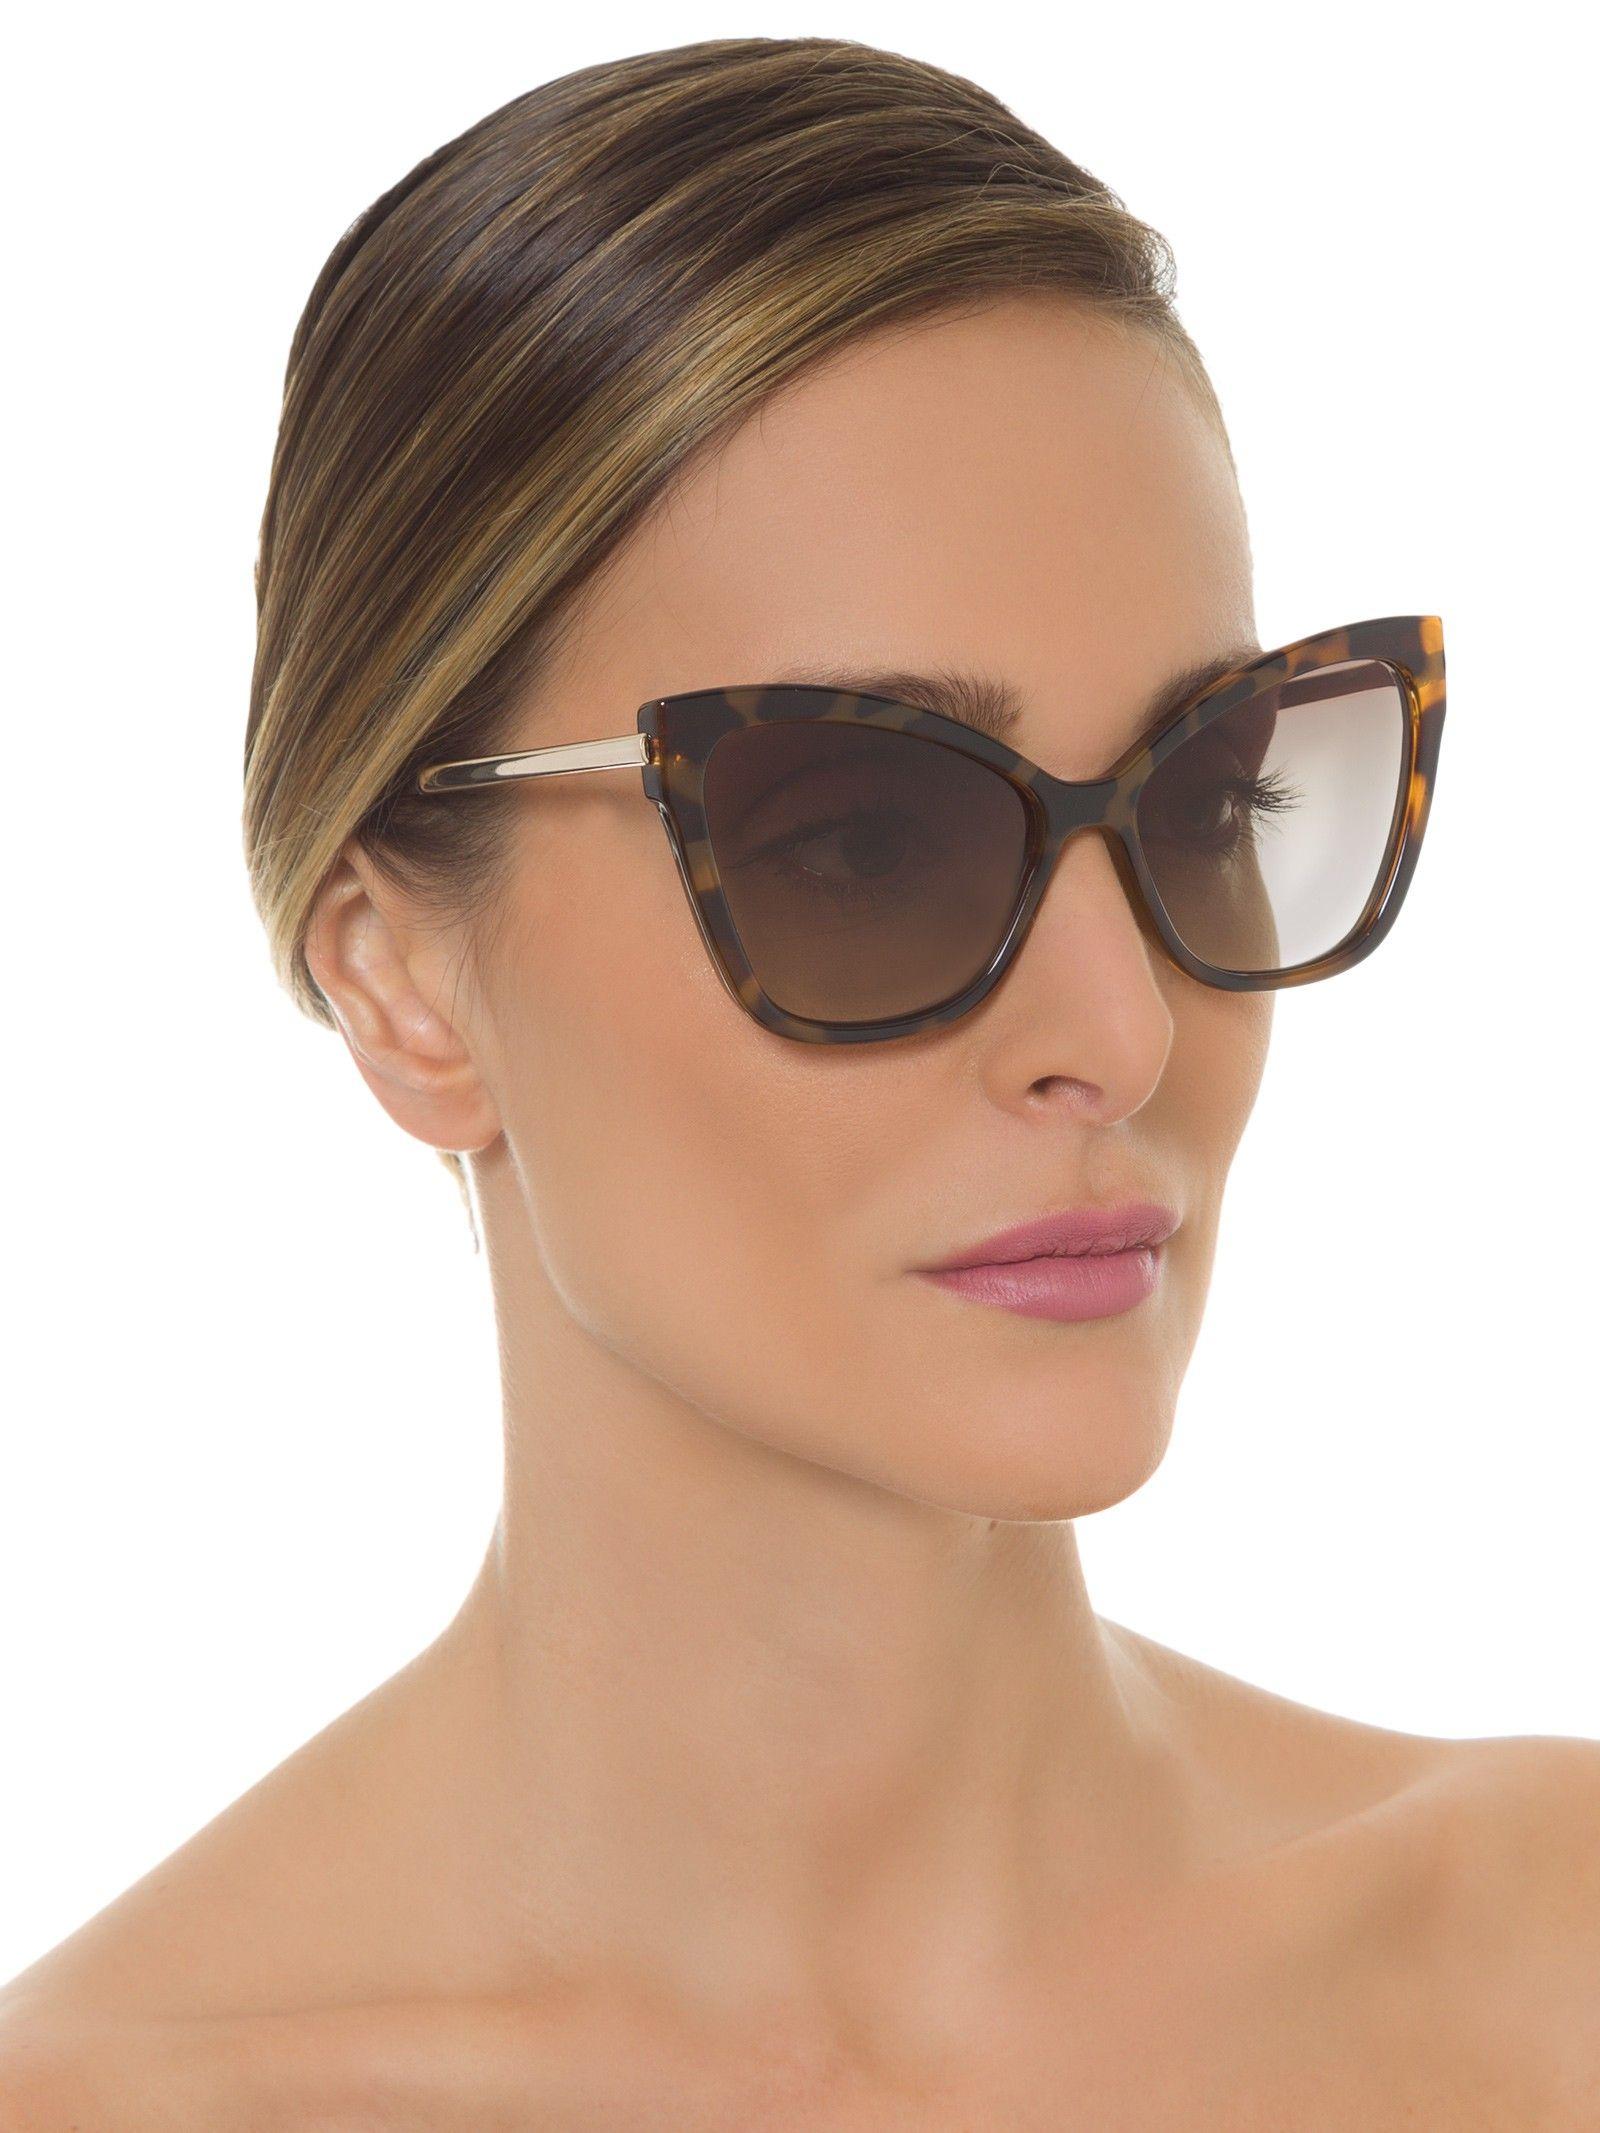 0e540cf2d Óculos Feminino Naked Eyes - Le Specs - Marrom - Shop2gether ...